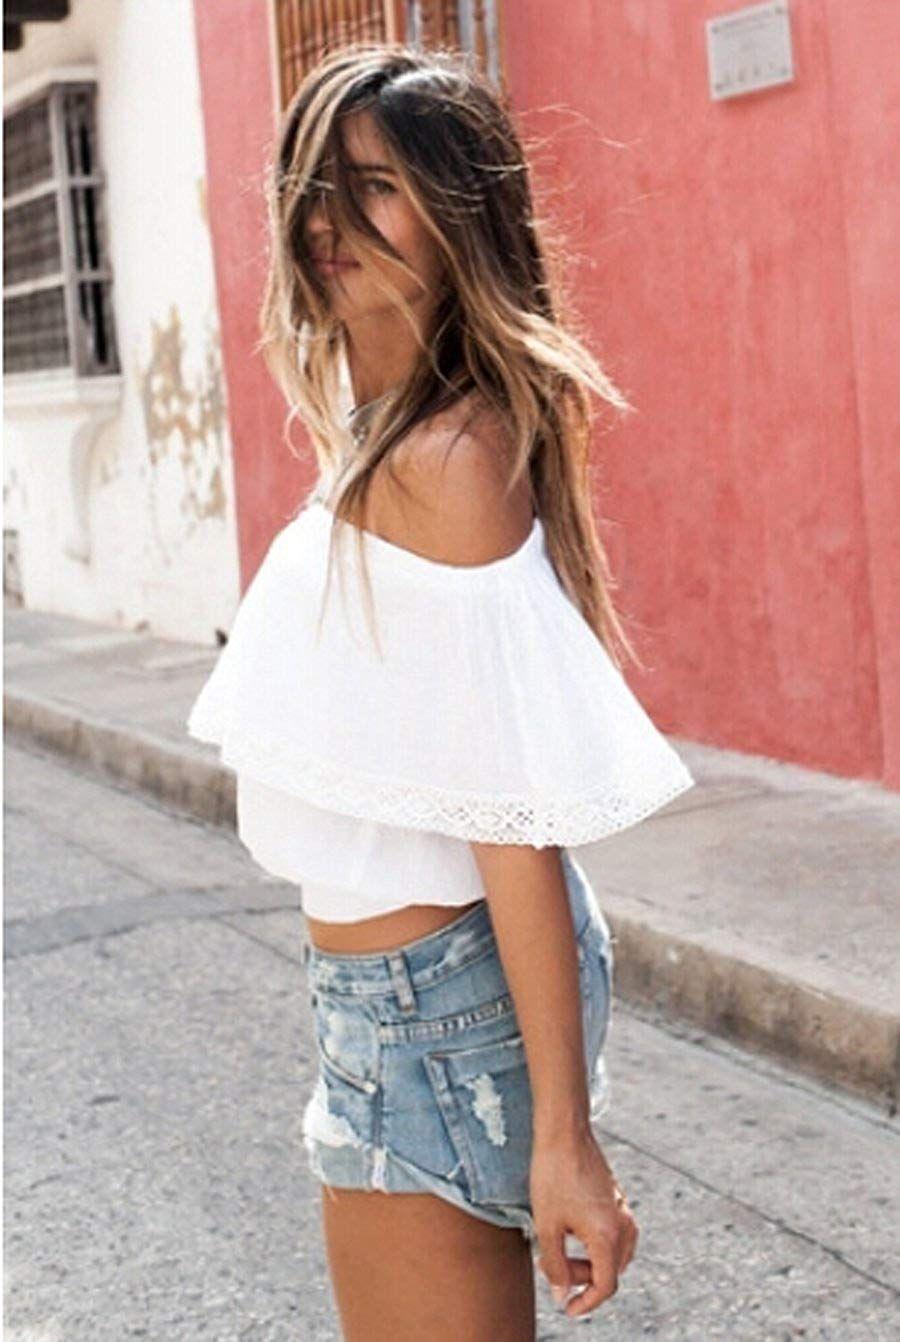 cfba147d4d92c  14.99 Relipop Women s Short Sleeve Shirt Strapless Blouses Off Shoulder  Tops at Amazon Women s Clothing store